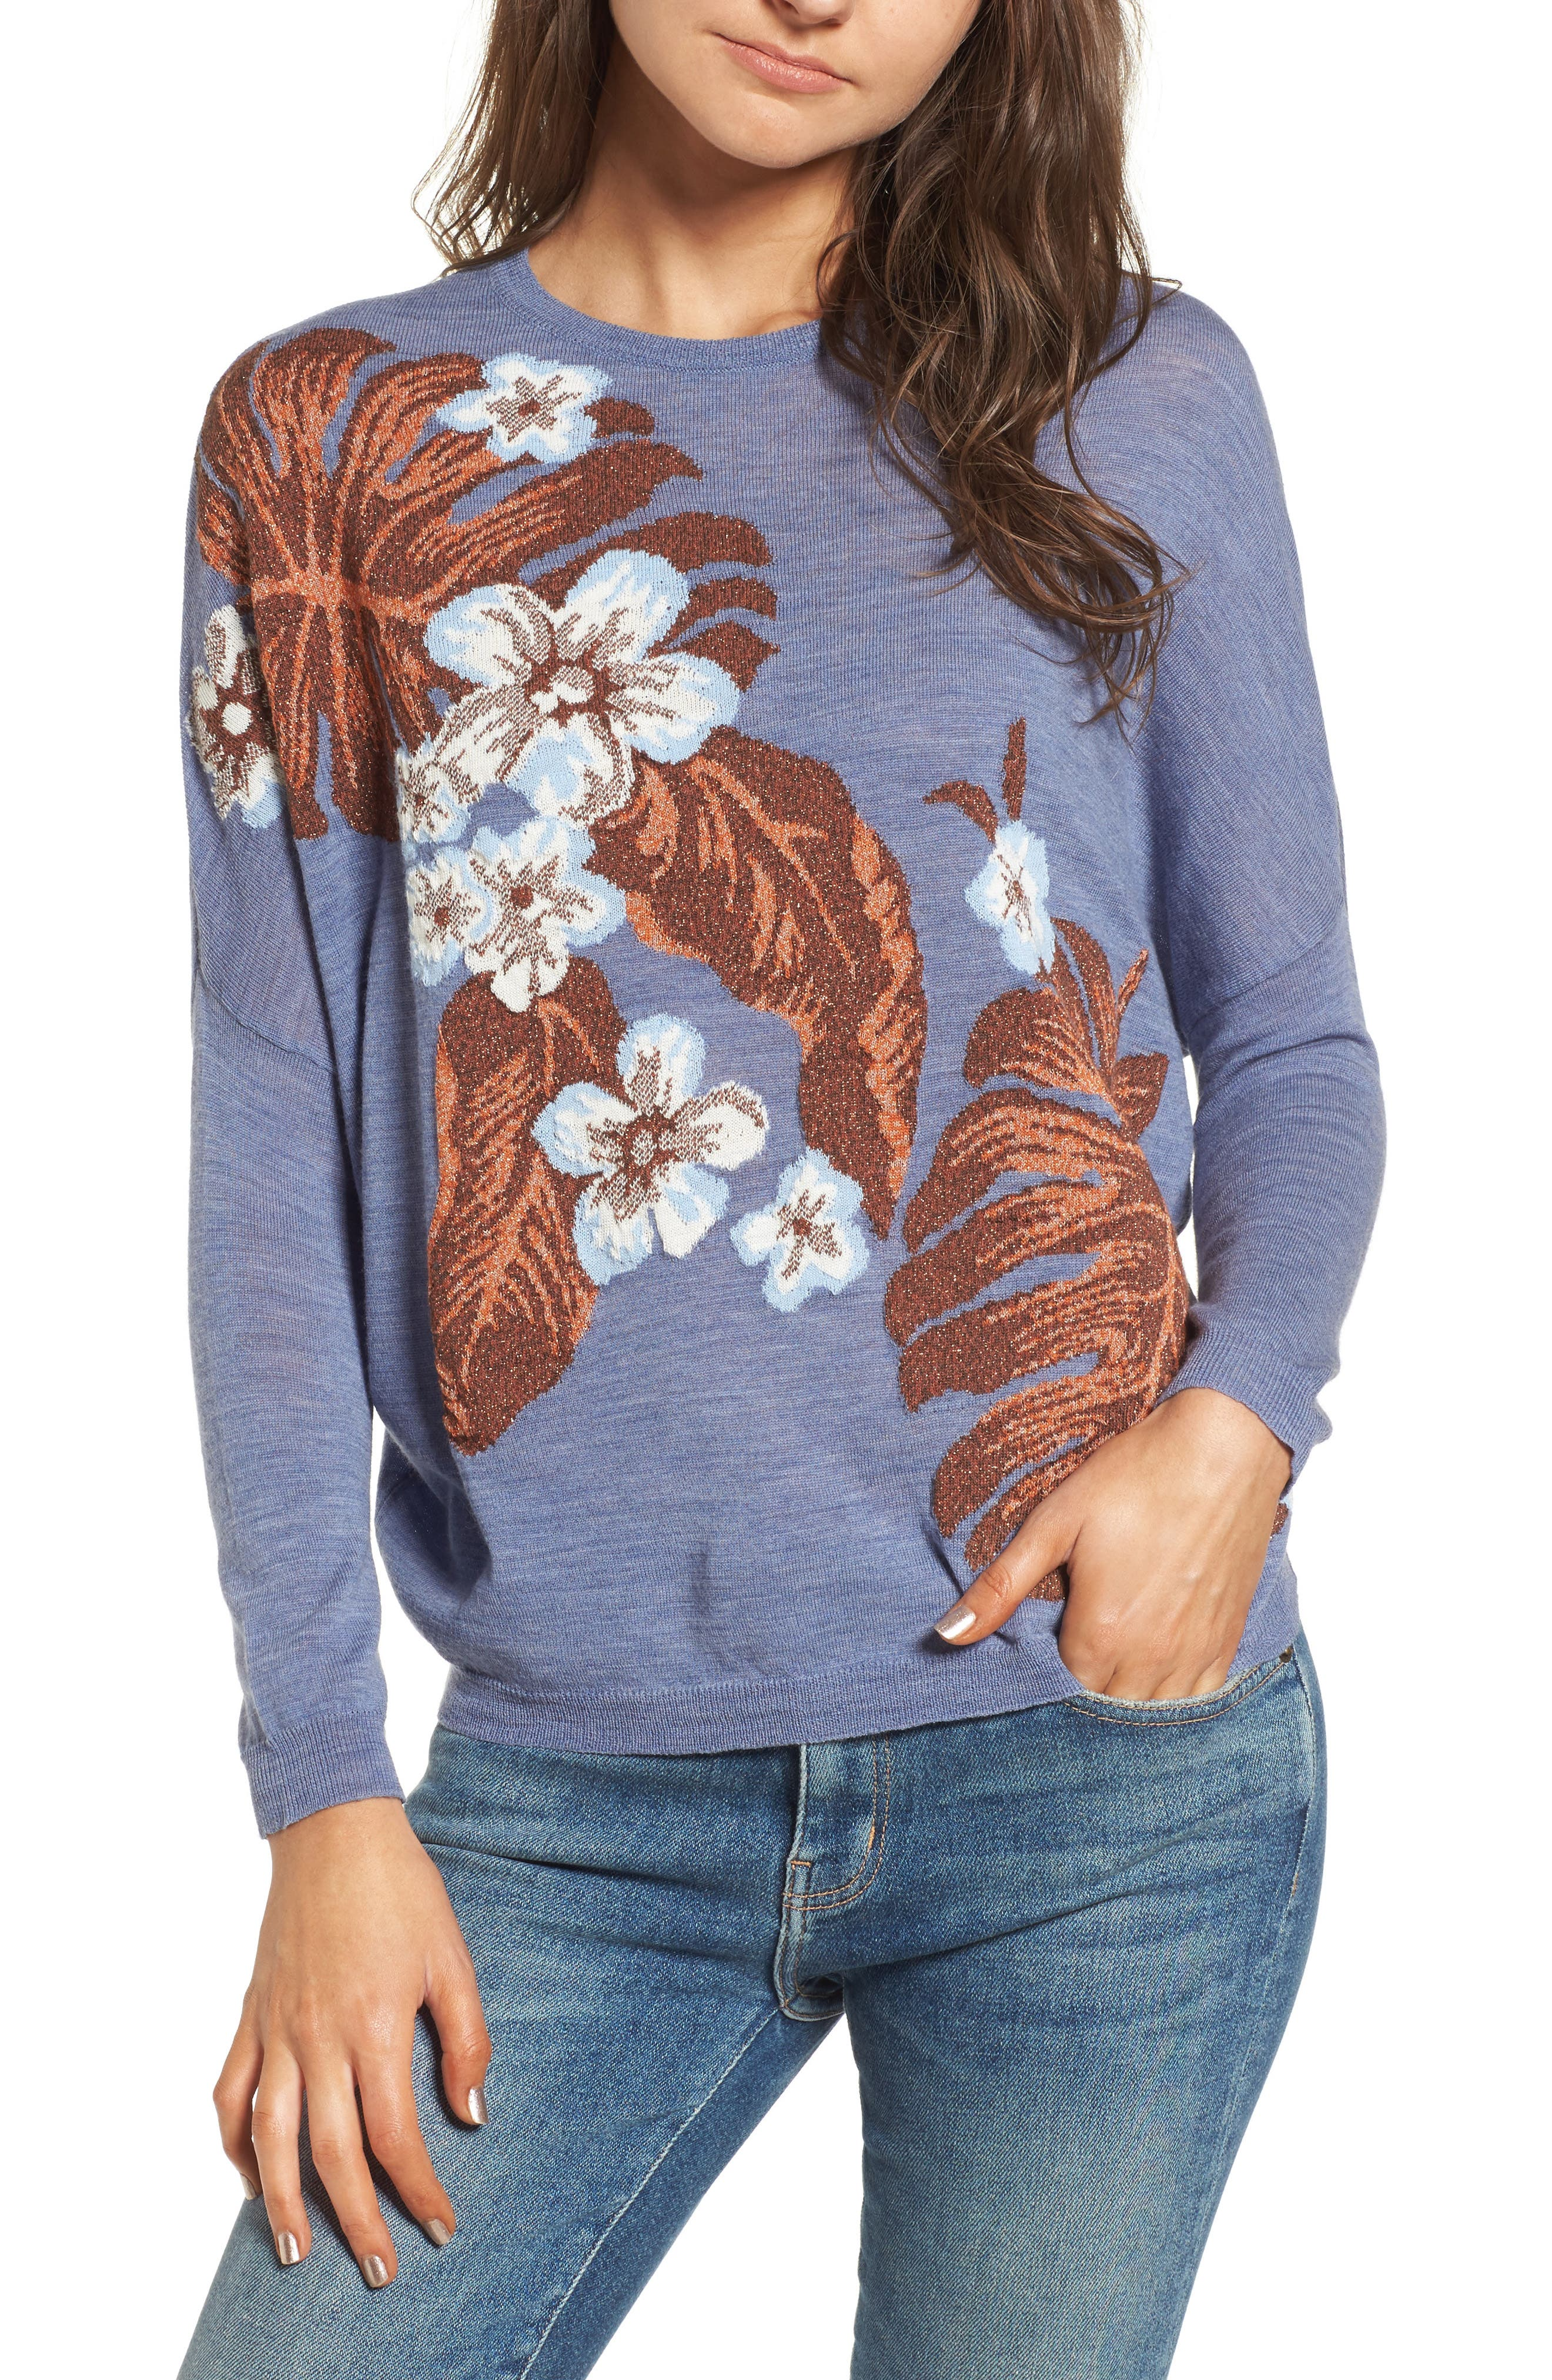 Blupalm Sweater,                             Main thumbnail 1, color,                             400